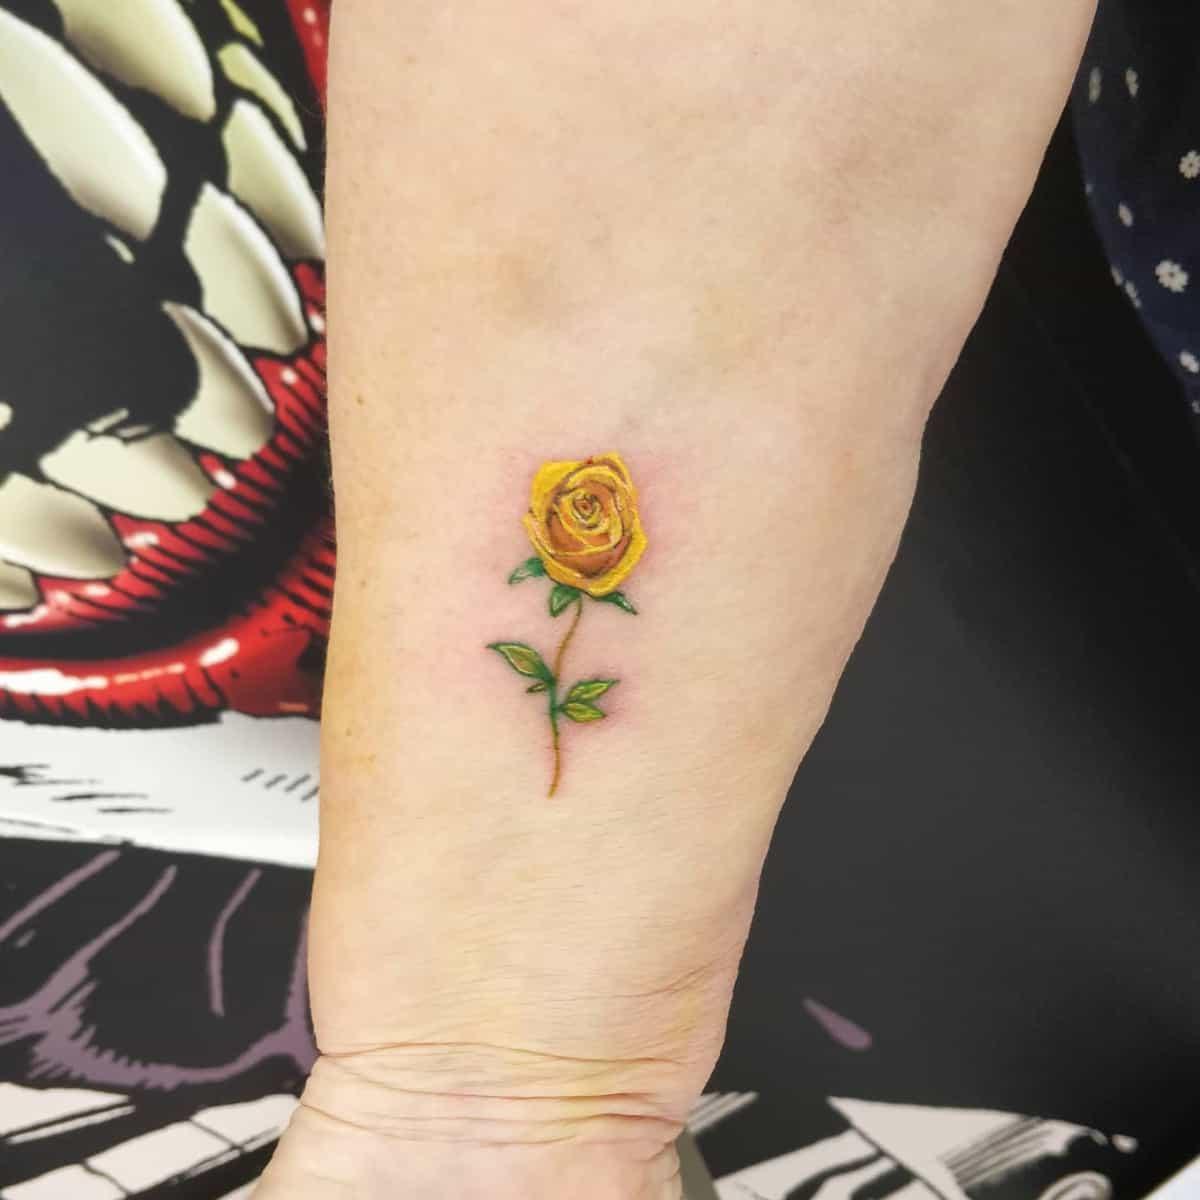 Small Yellow Rose Tattoo -stus_tattoos